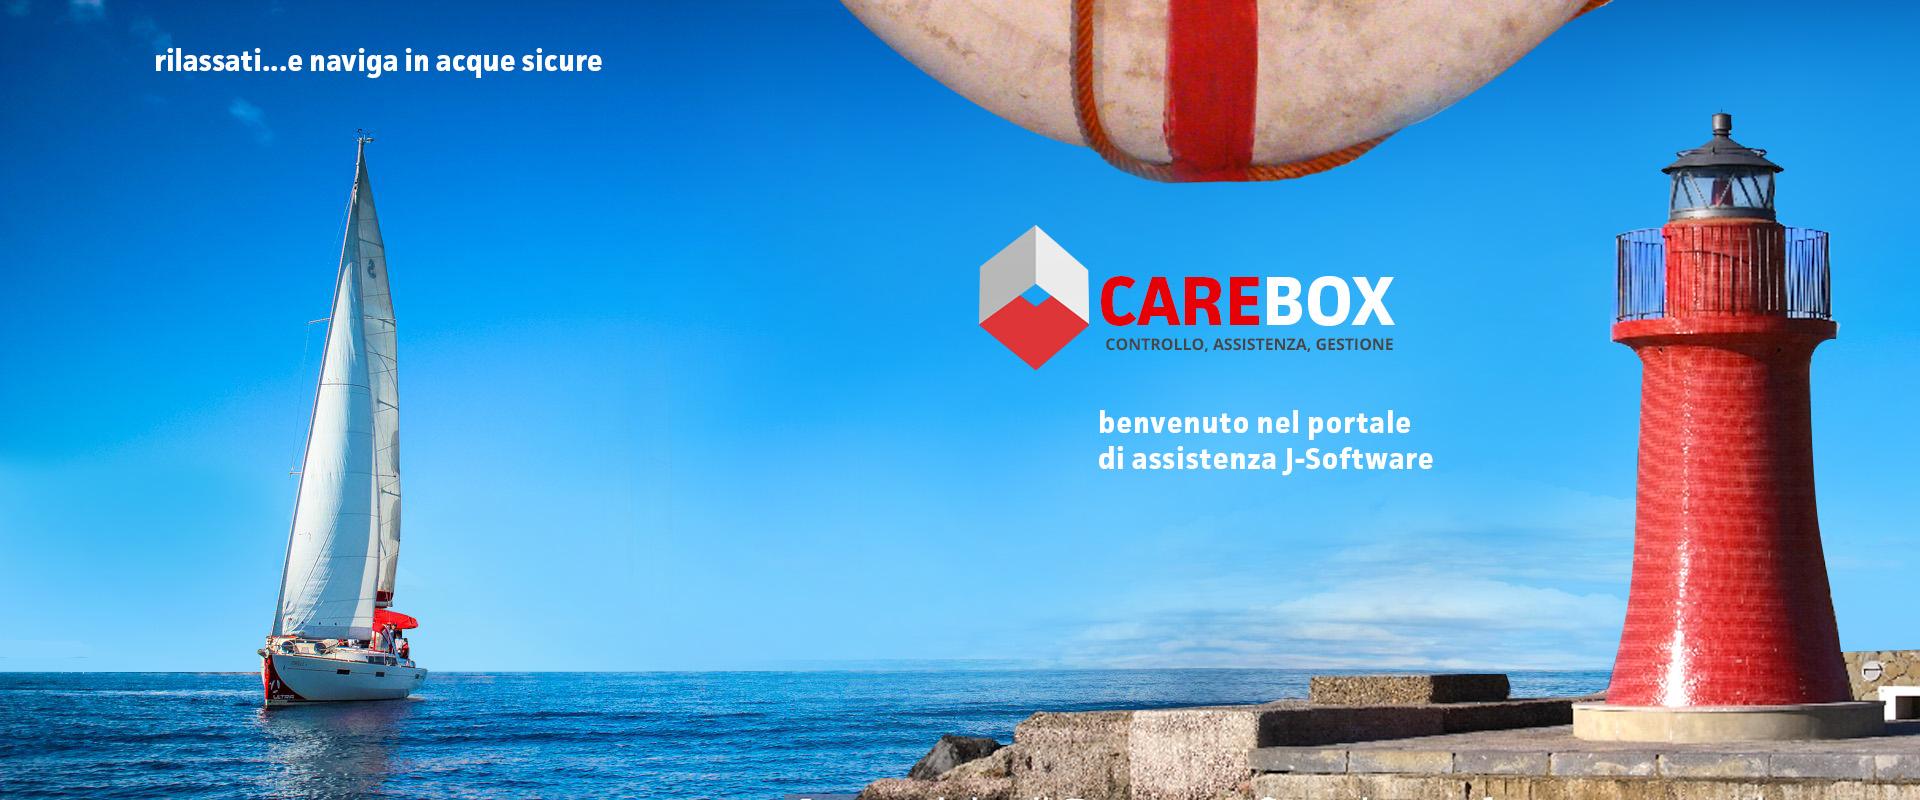 carebox_benvenuto